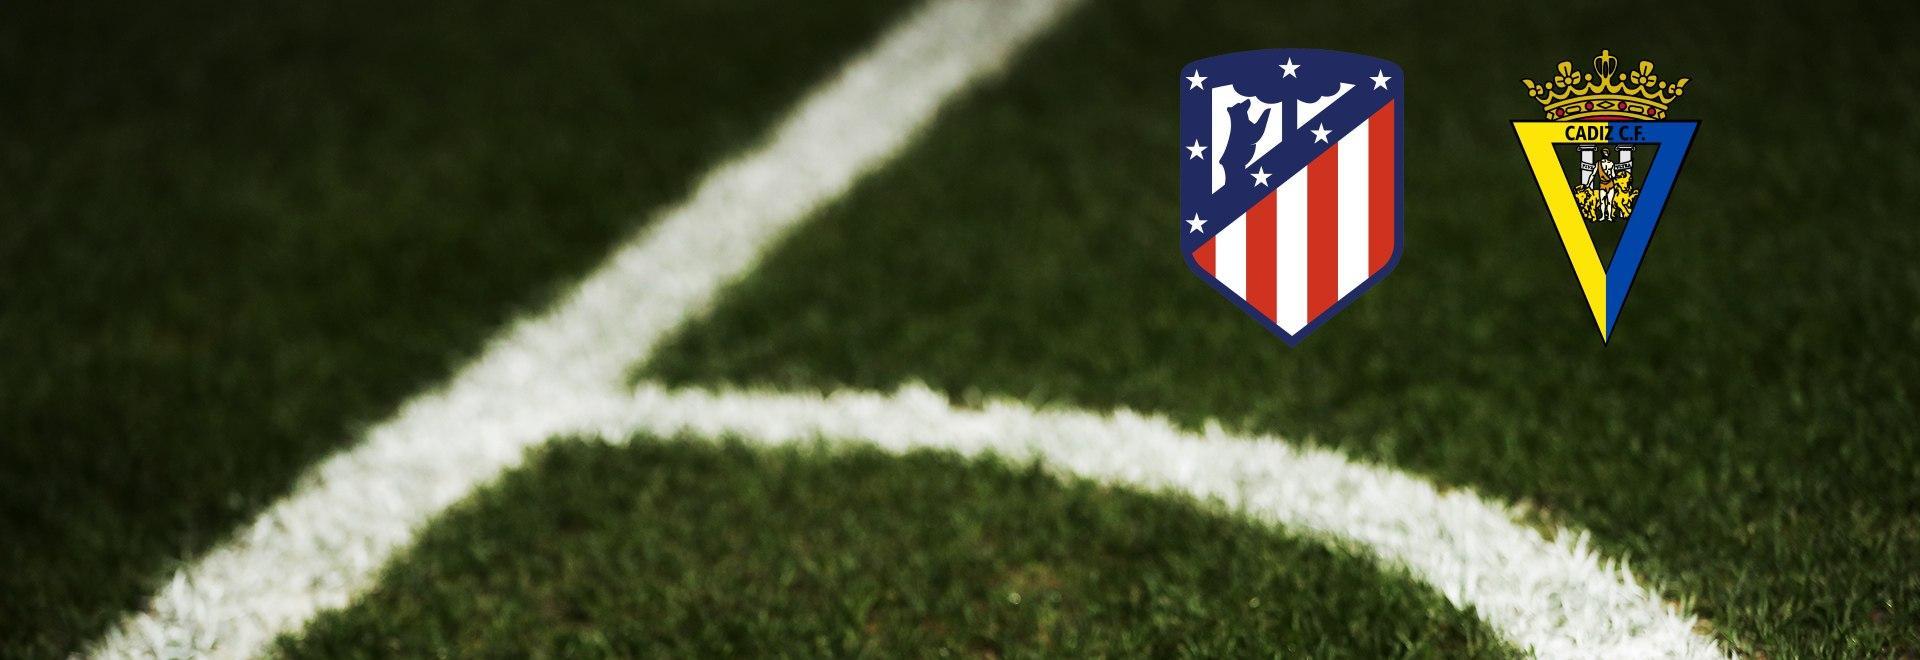 Atletico Madrid - Cadice. 9a g.